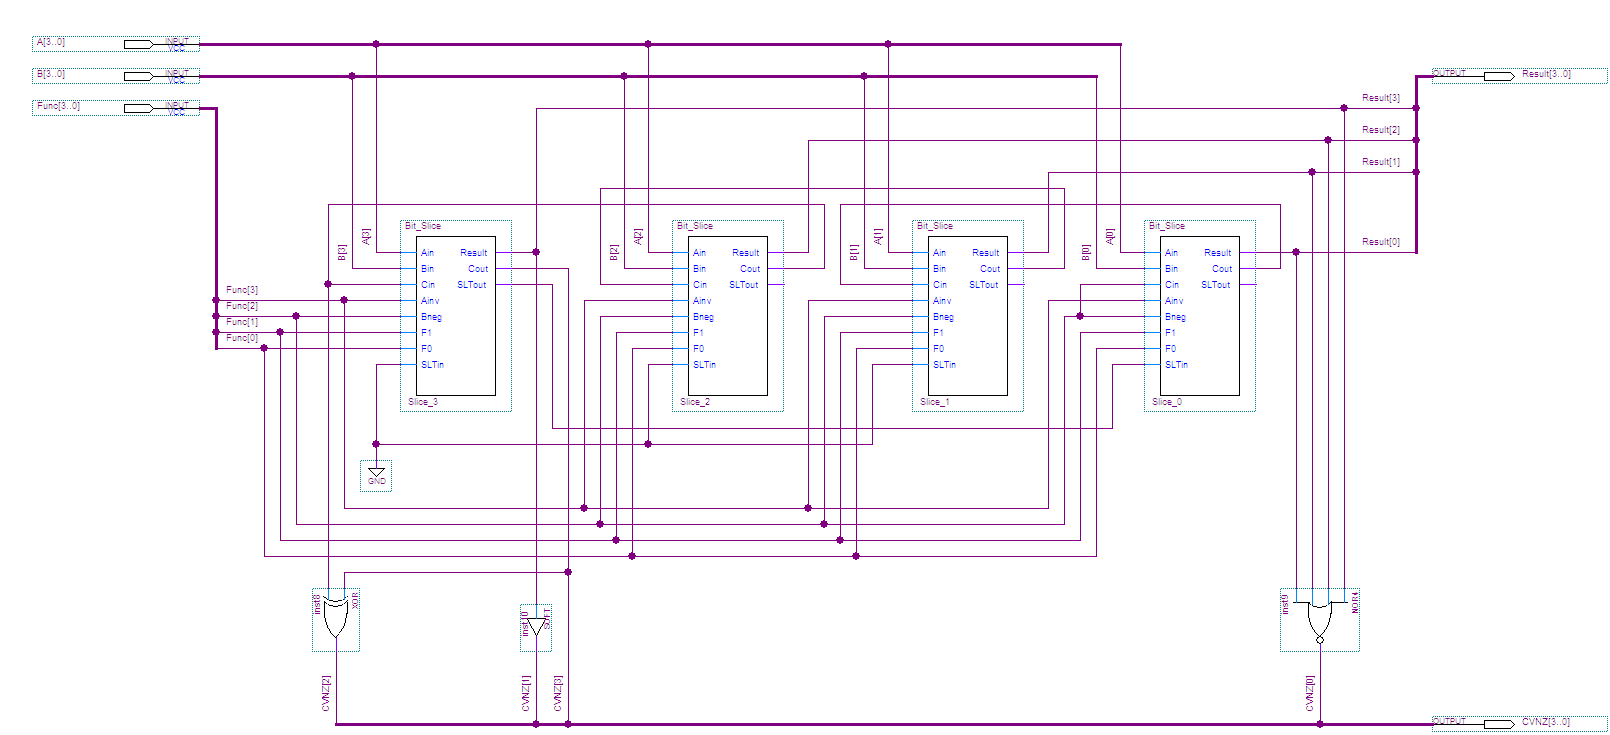 MIPS ALU schematic diagram